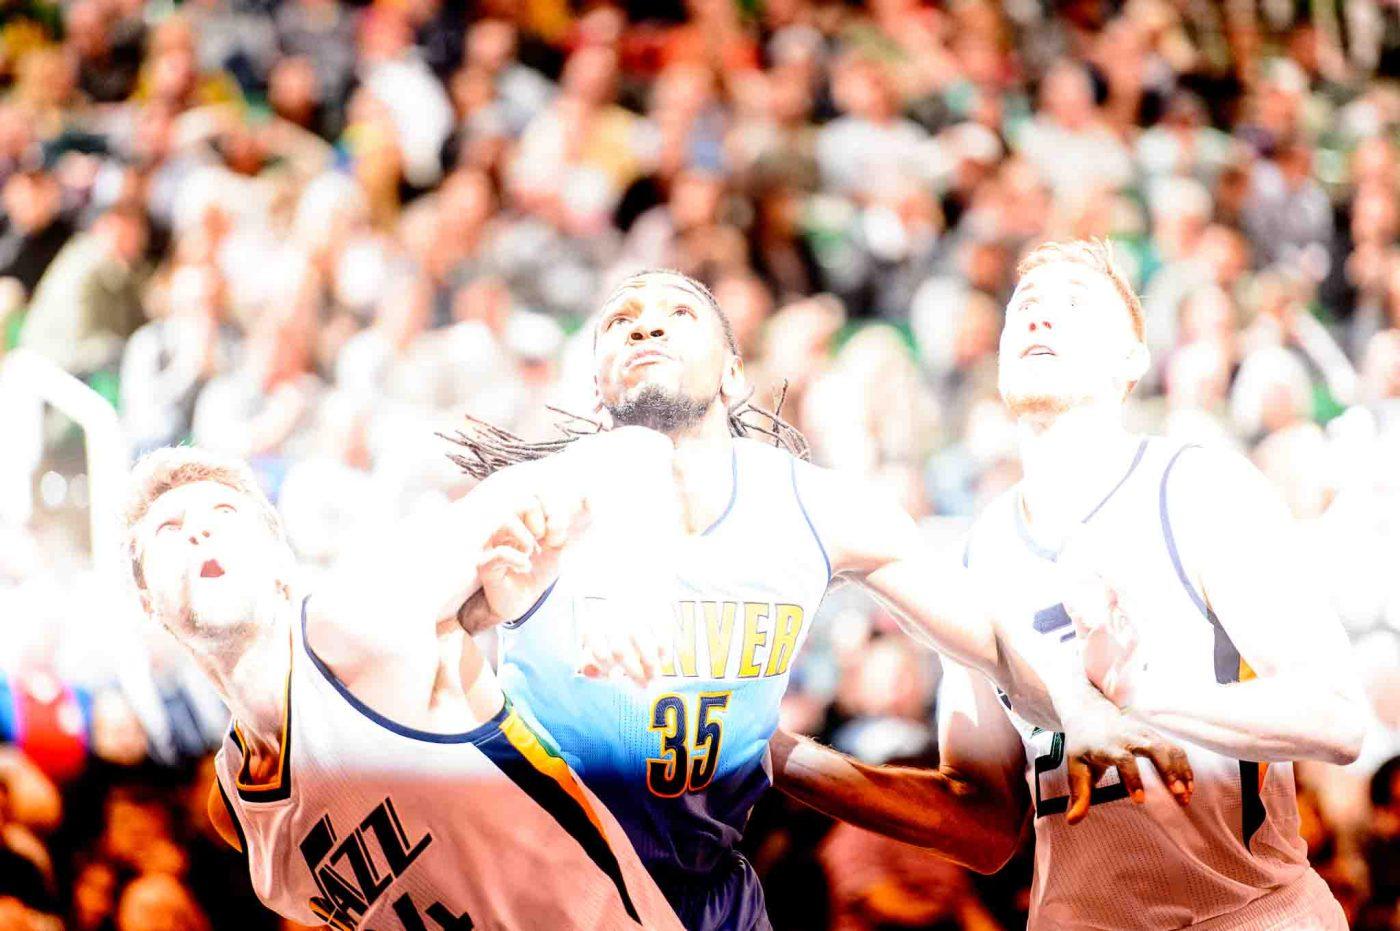 Trent Nelson | The Salt Lake Tribune Utah Jazz center Jeff Withey (24) Denver Nuggets forward Kenneth Faried (35) Utah Jazz forward Gordon Hayward (20) as the Utah Jazz host the Denver Nuggets in Salt Lake City, Wednesday November 23, 2016.